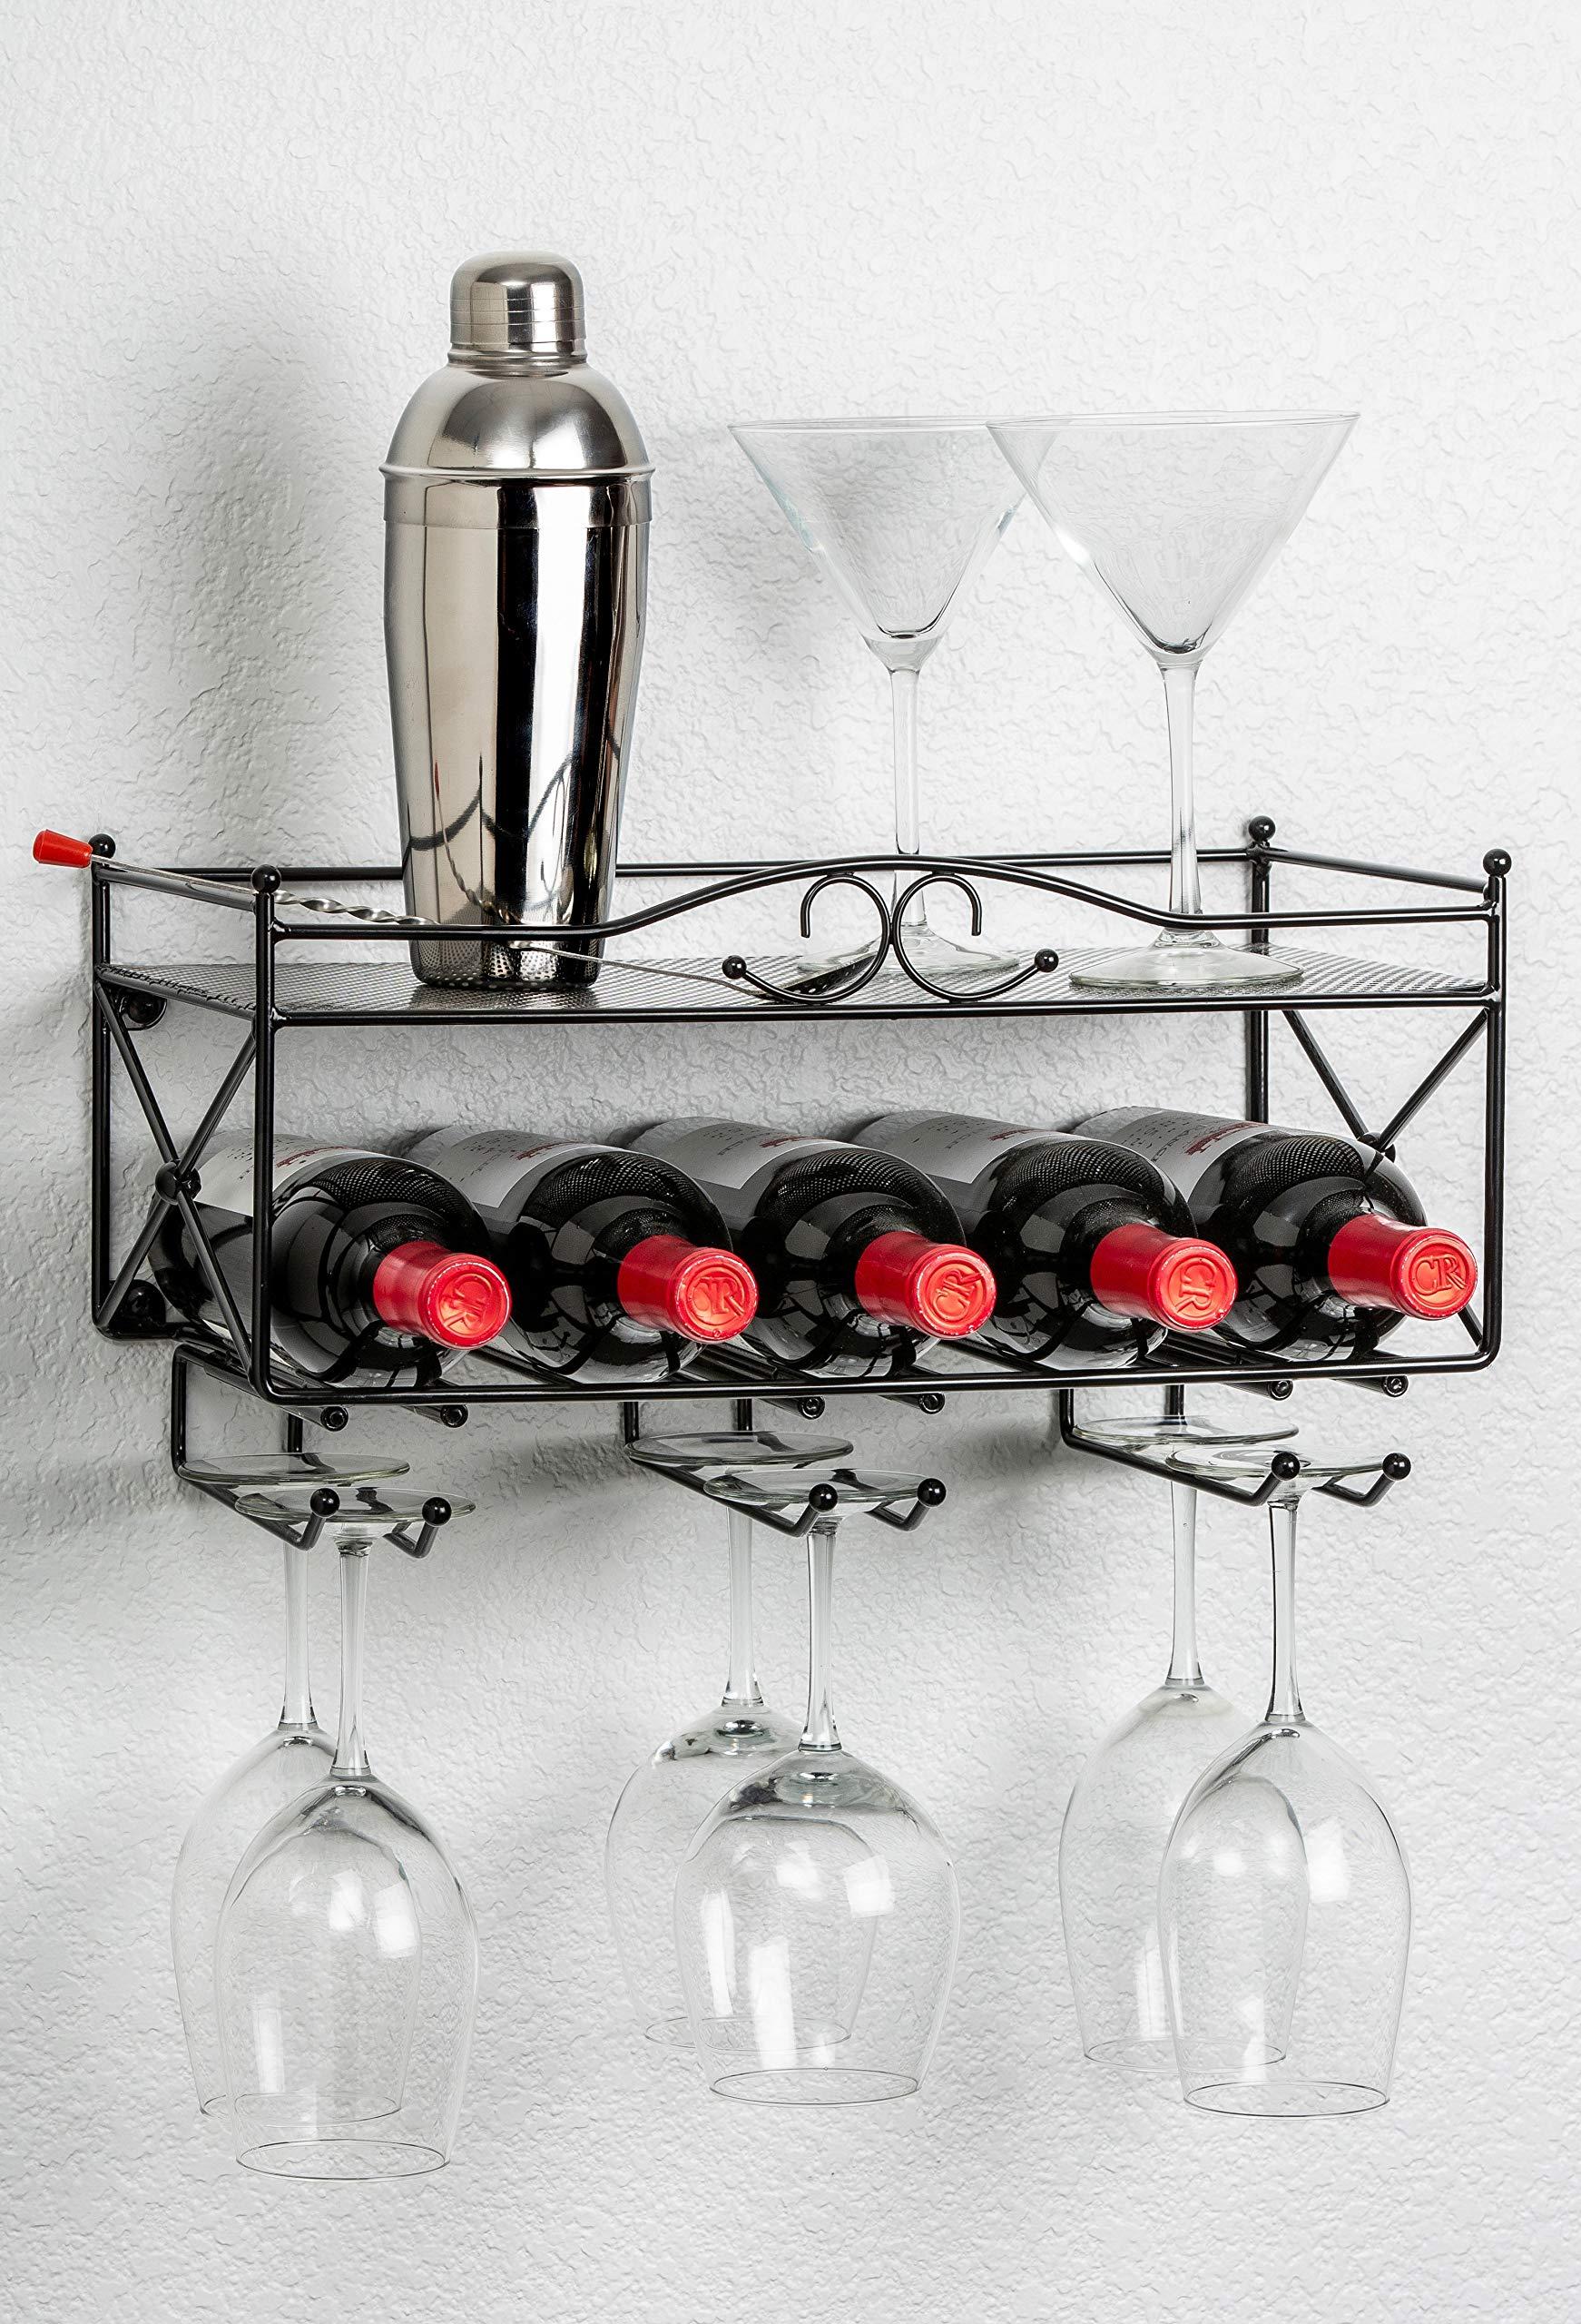 Mango Steam Wall-Mounted Wine Rack with Shelf and Stemware Glass Holder by Mango Steam